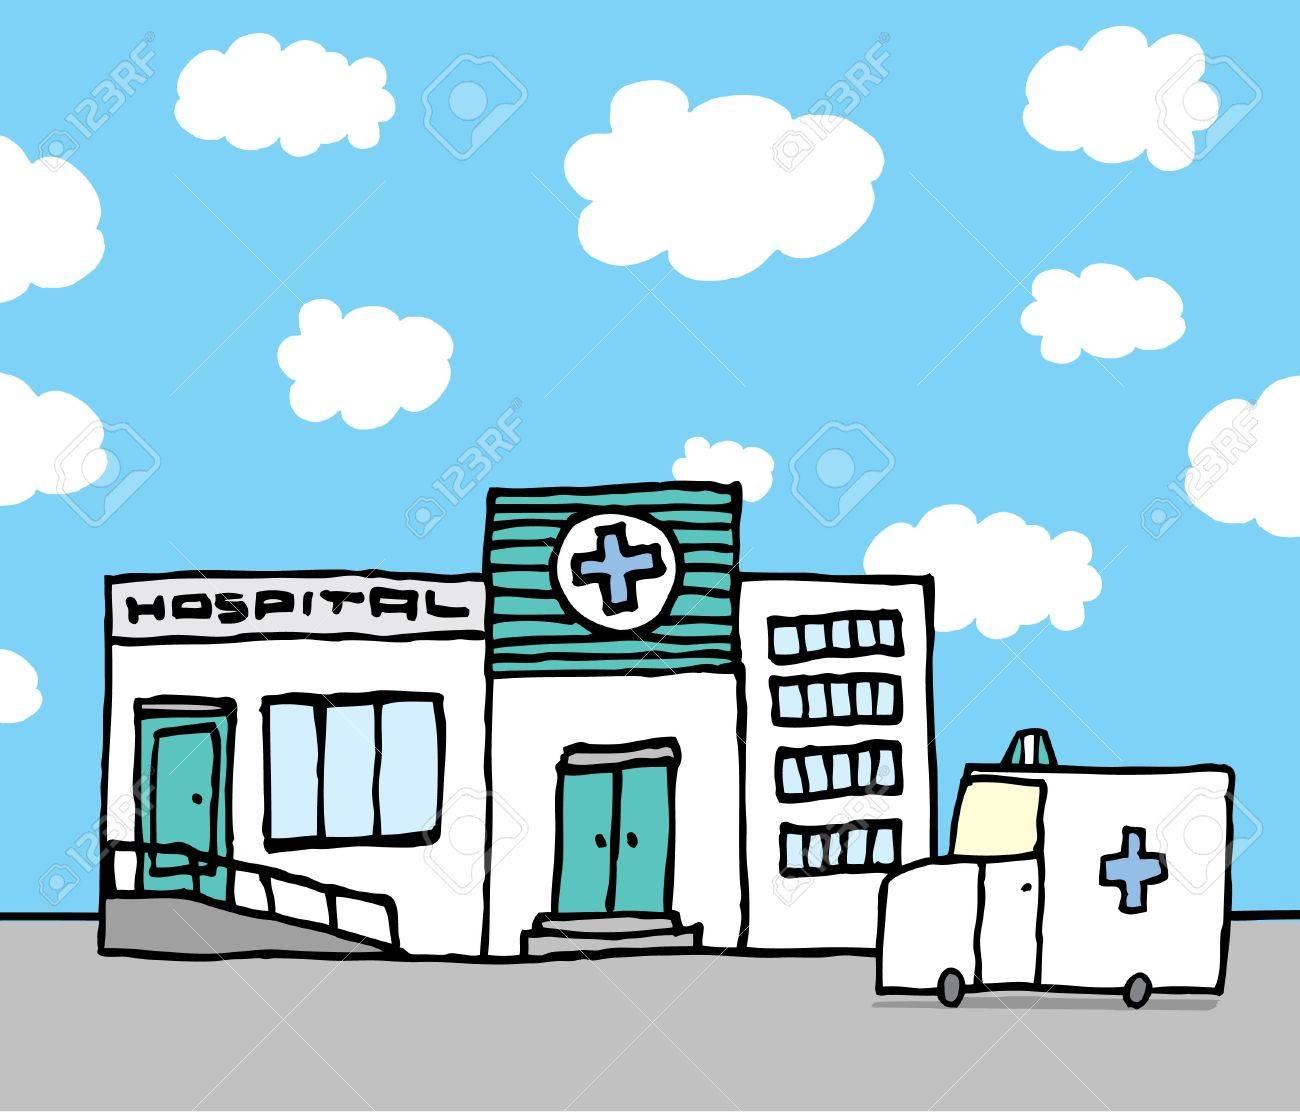 Hospital and ambulance Stock Vector - 19150718